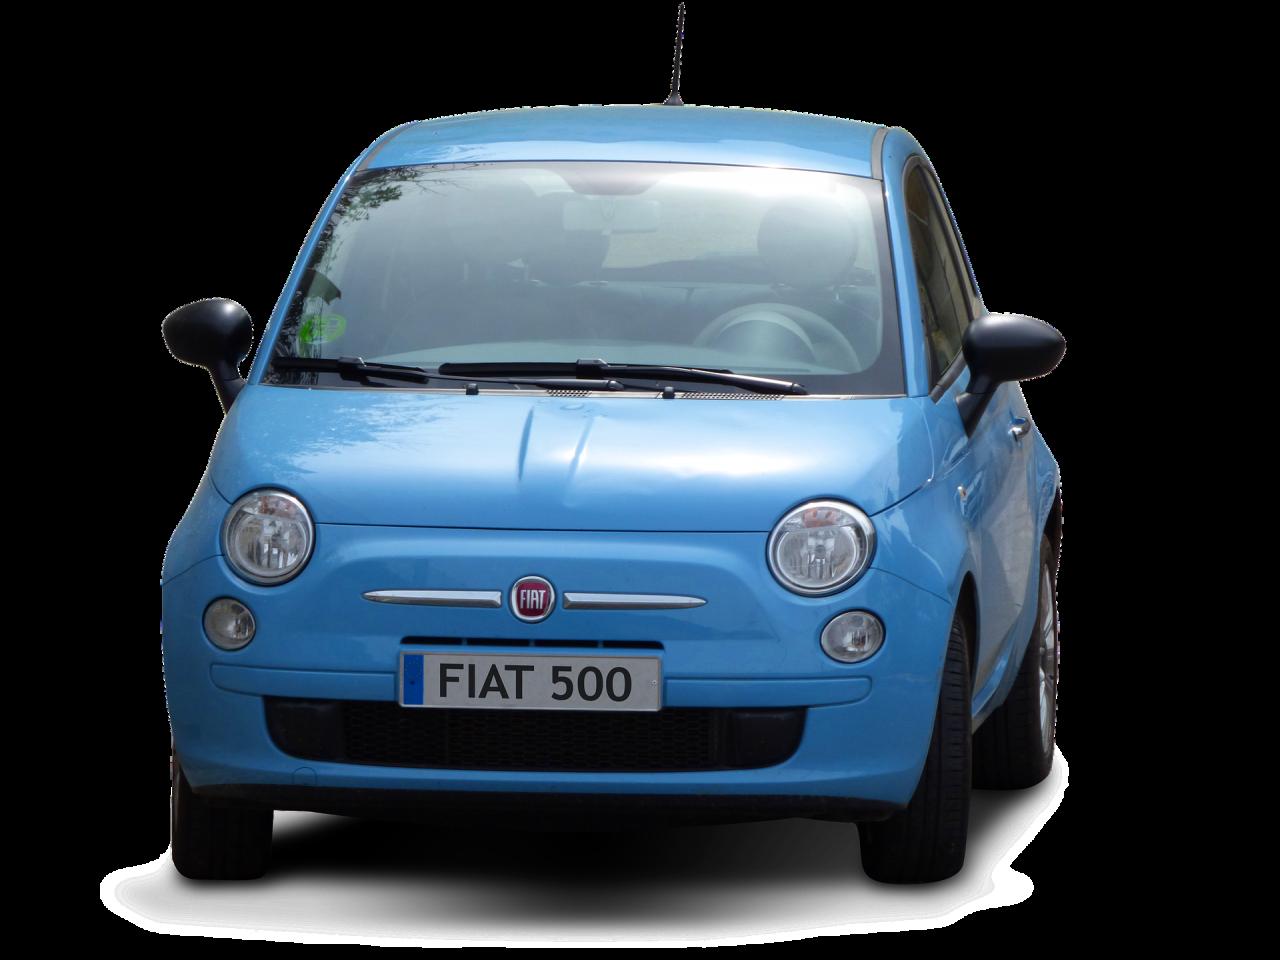 Blue Fiat 500 PNG Image